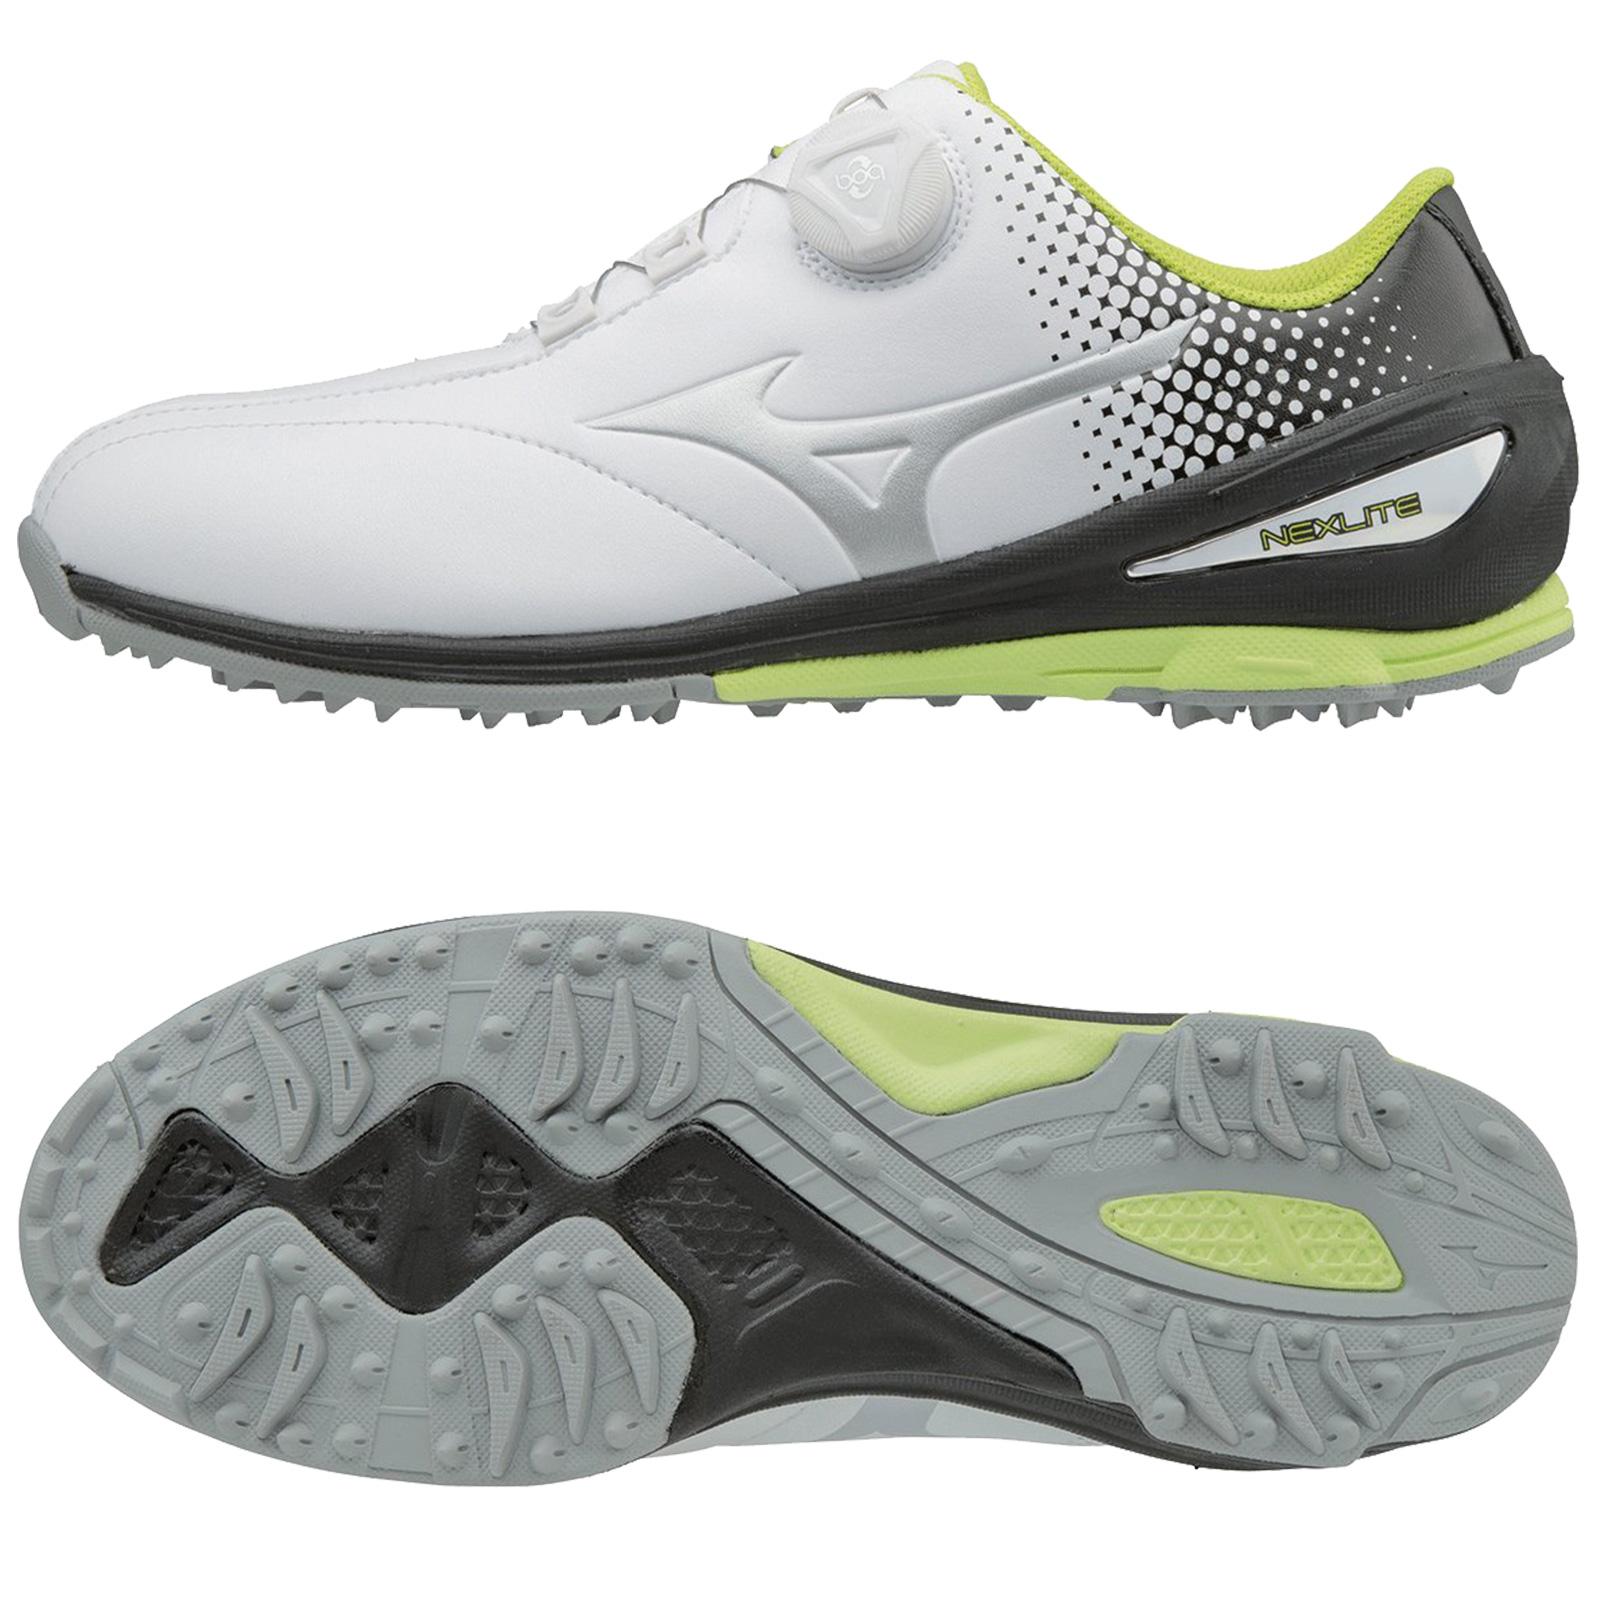 mizuno golf shoes size chart european medium leather 70